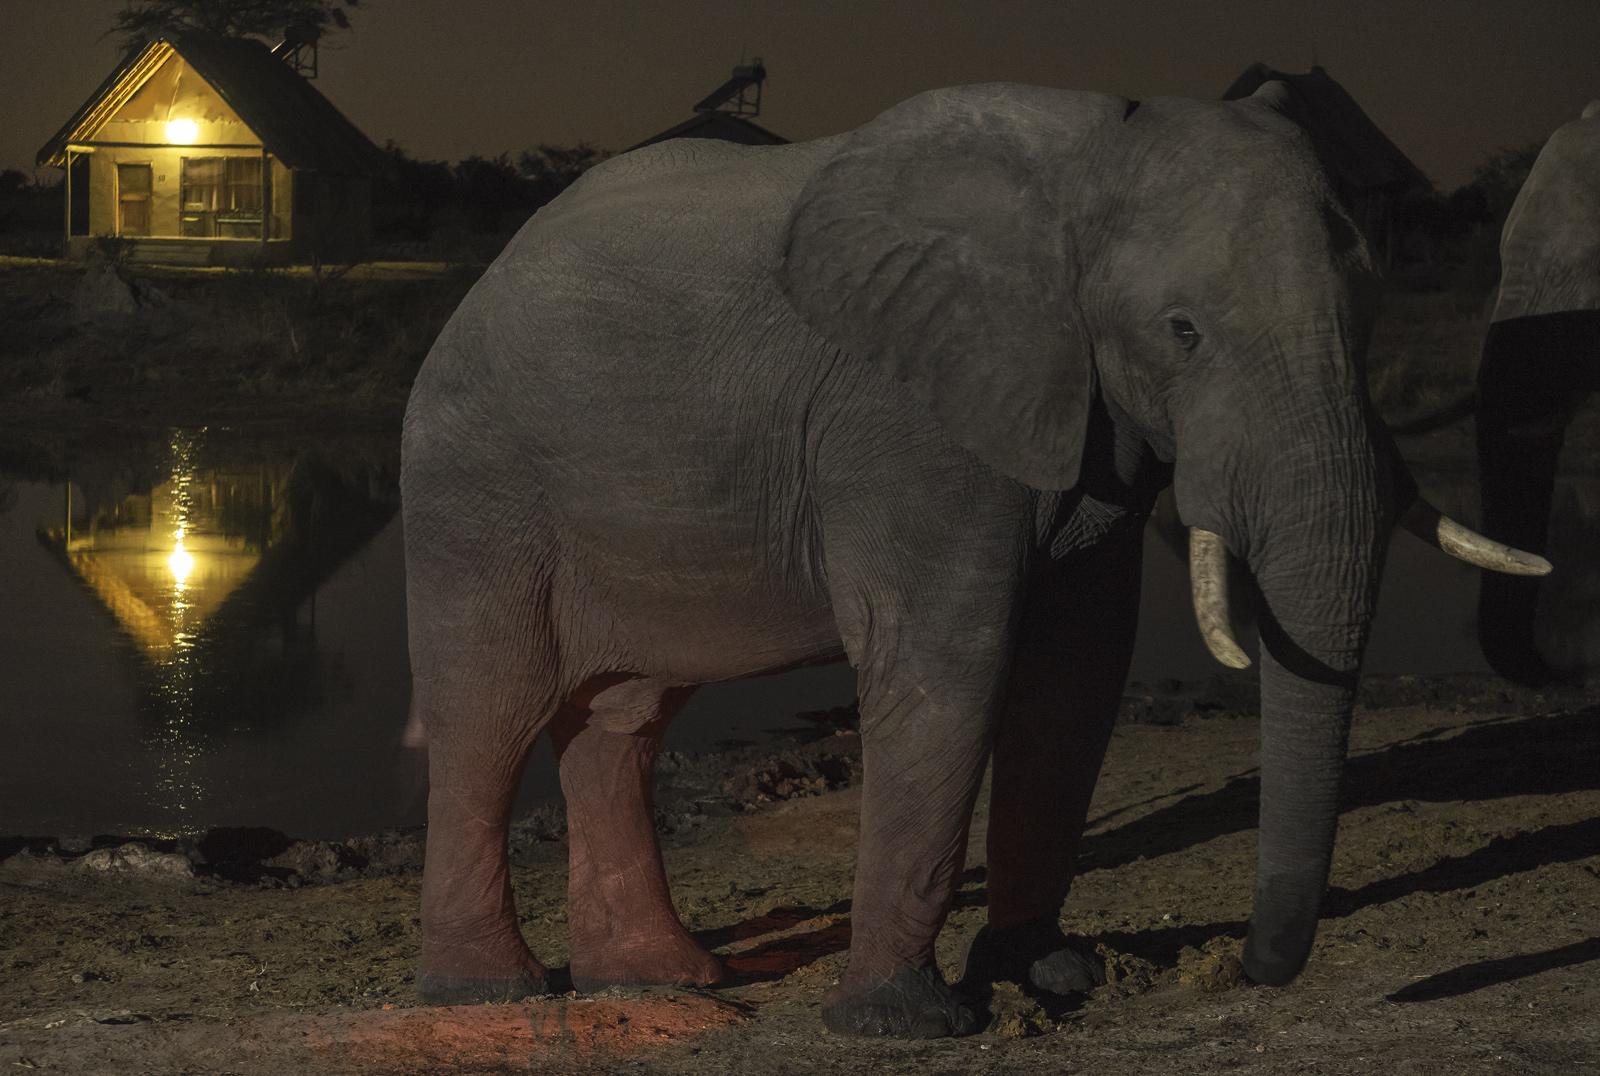 Elephant Sands Bull, Elephant Sands, Botswana, Africa, evening, waterhole, ambient, lodge, lights, drink, elephant , photo